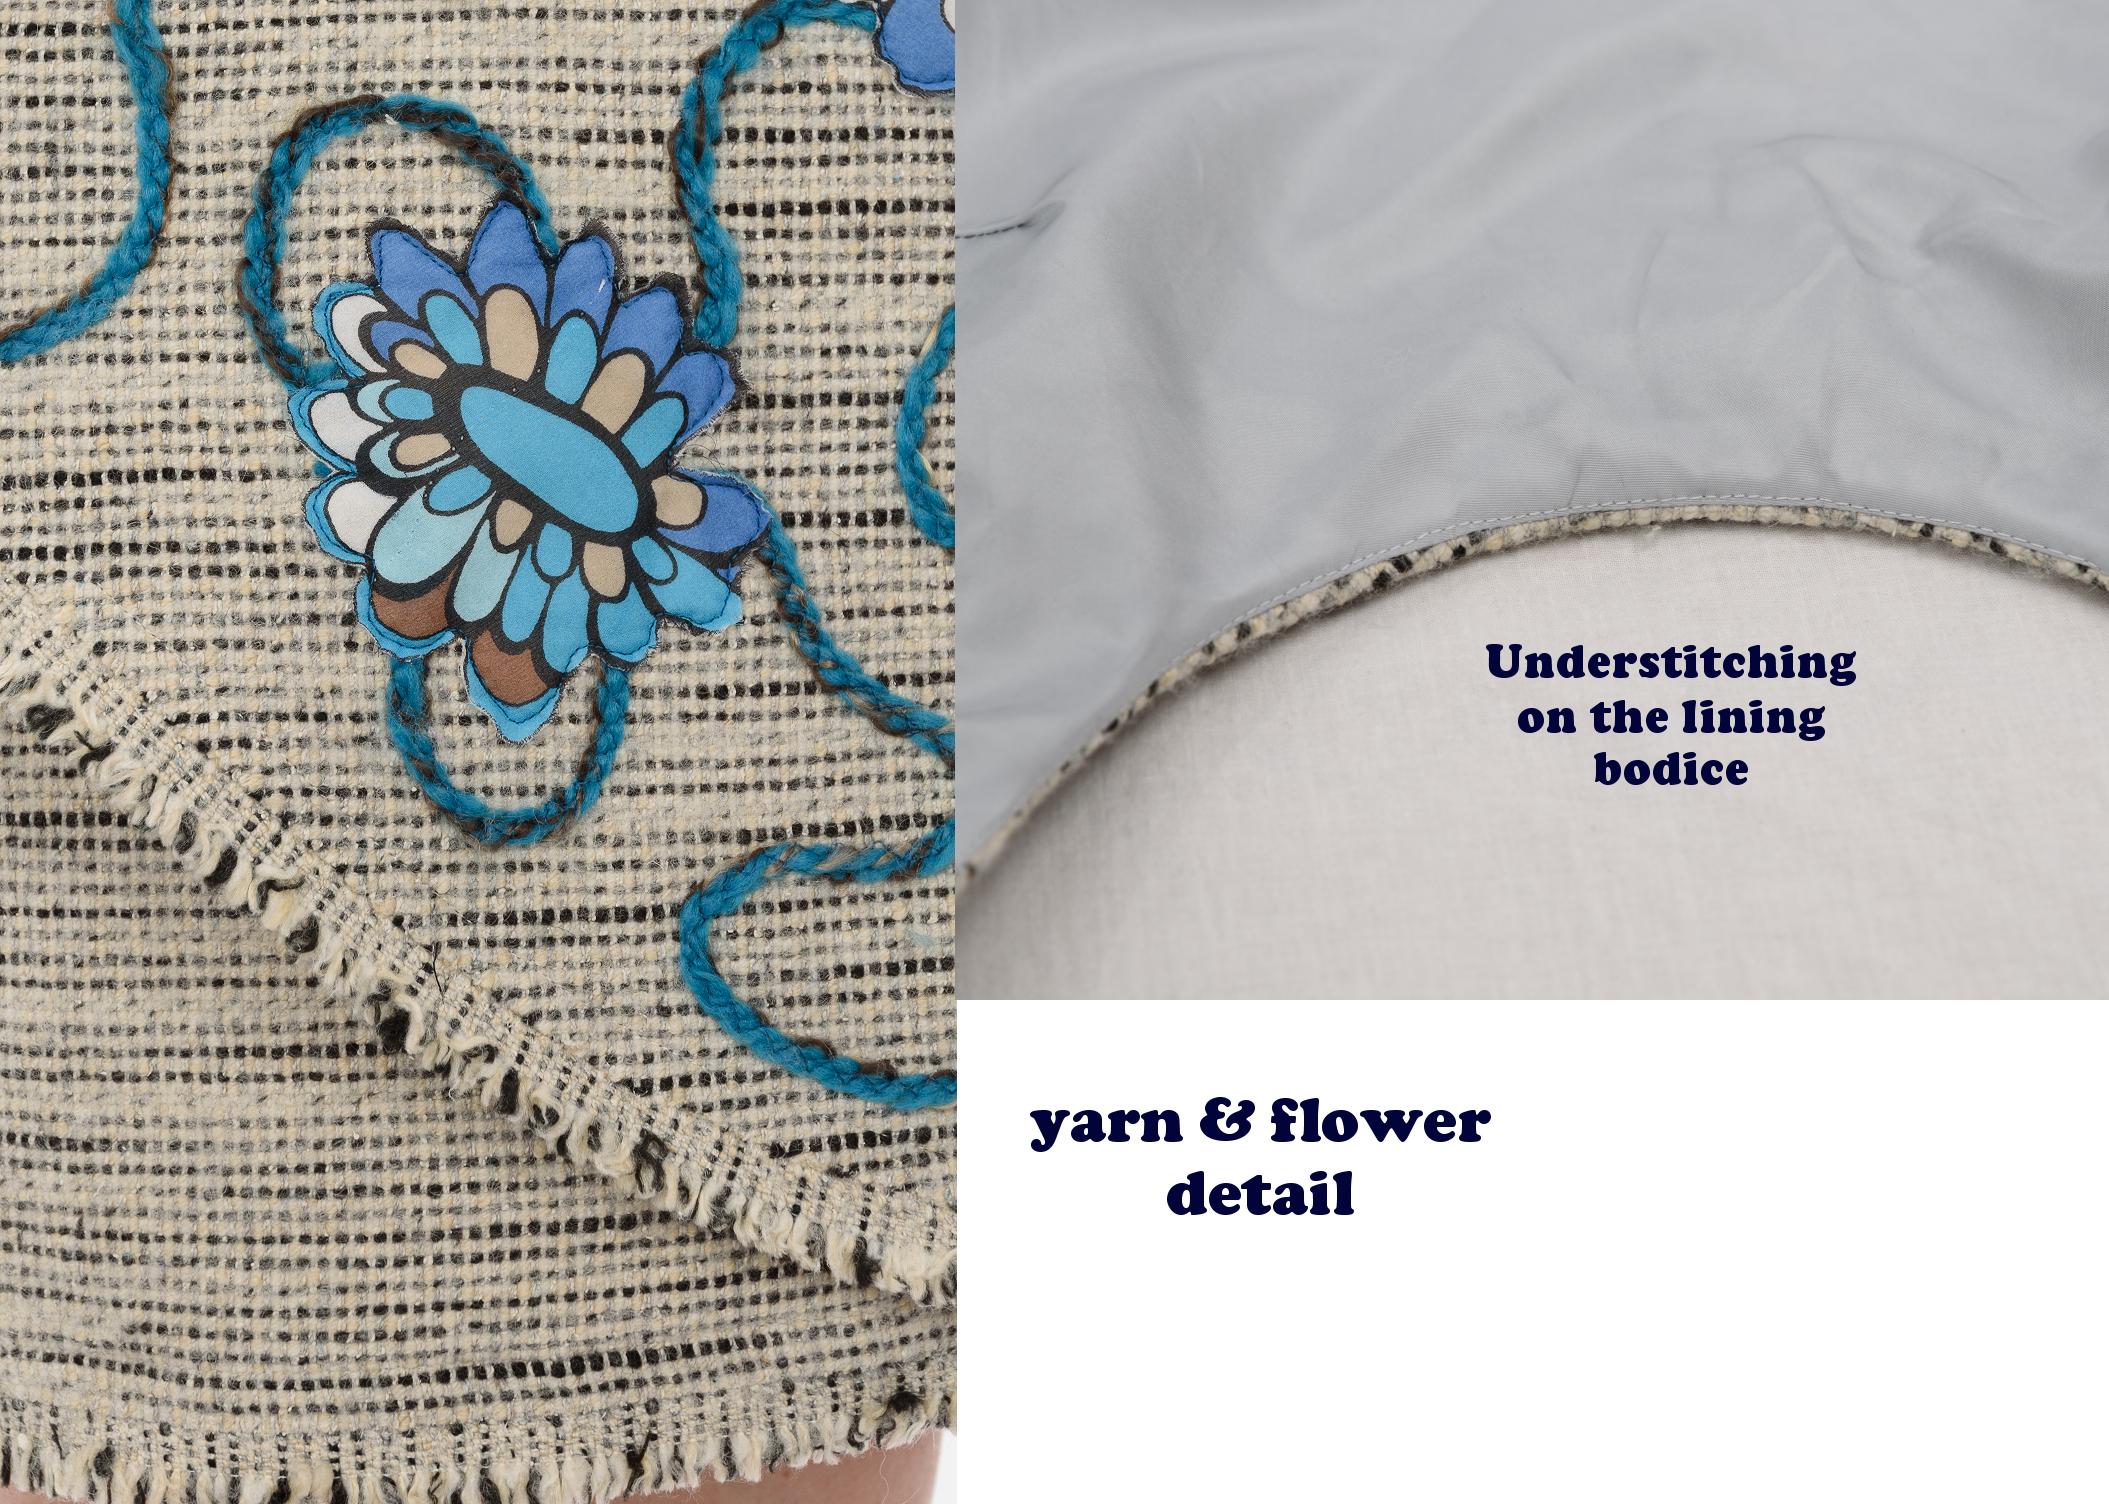 Vogue Patterns Misses' DressKay Unger 1242 pattern review